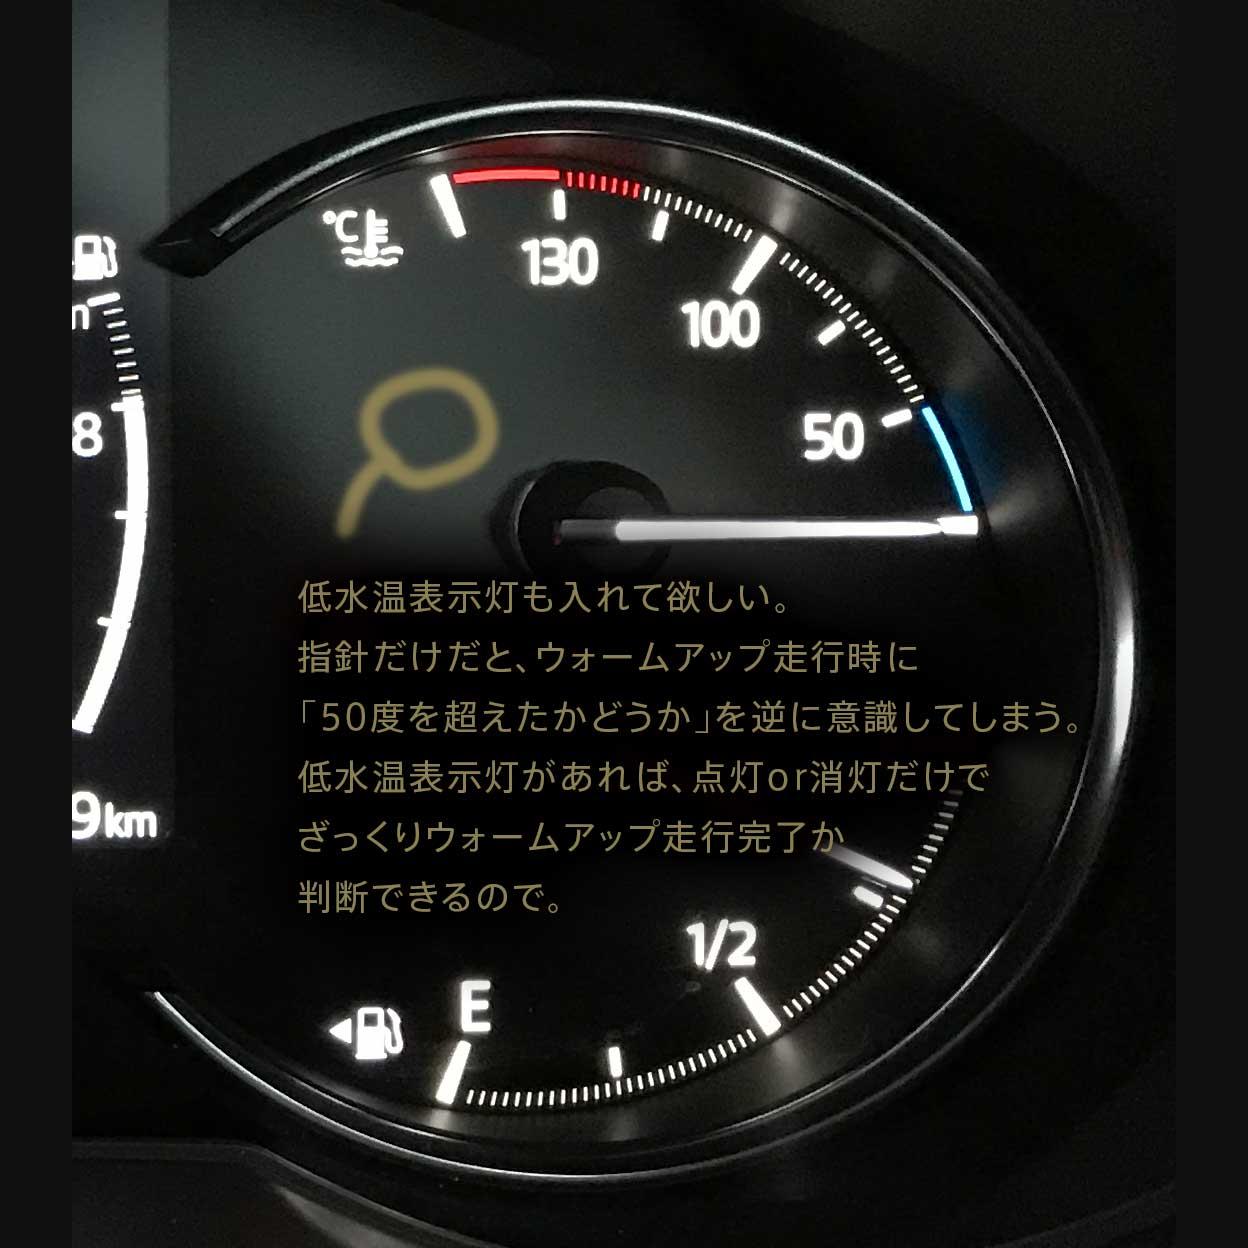 MAZDA CX-8を2台乗ってきて感じた!マツダのTFT液晶メーターの弱点や改善すべきポイントとは? mazda_cx-8_cx8_tft_lcd_meter_02